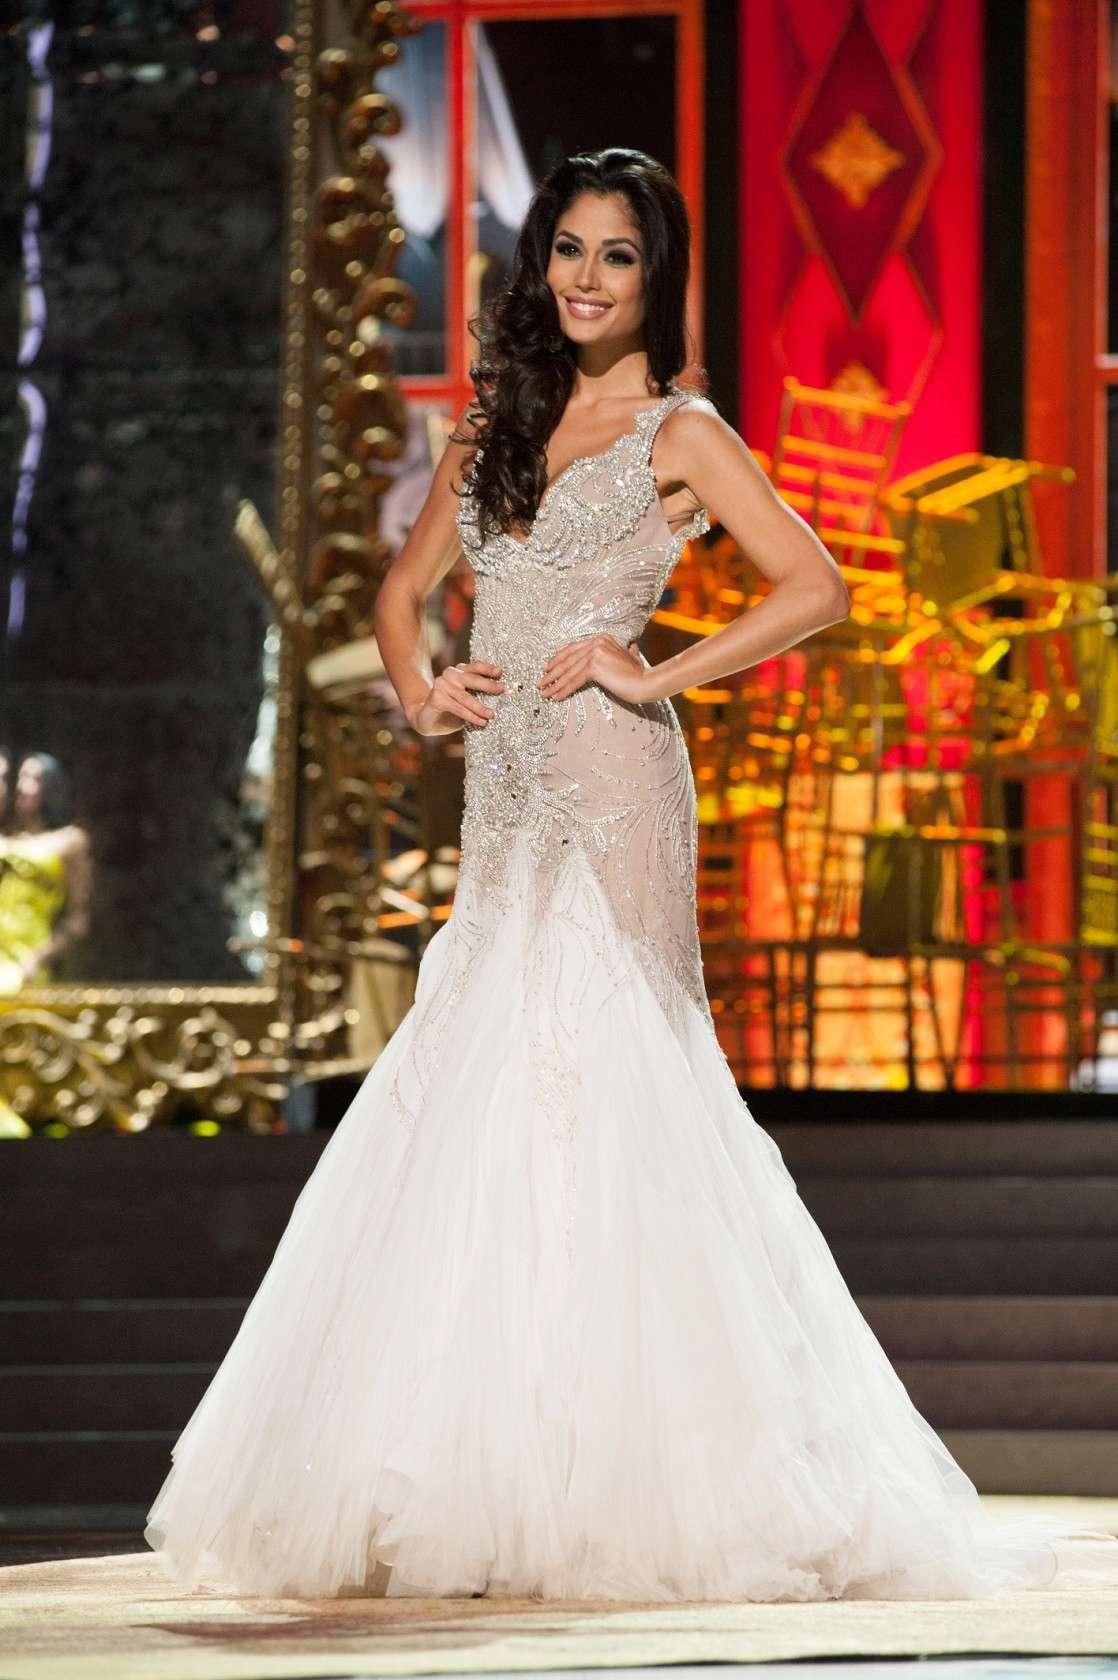 patricia yurena rodriguez, miss espana 2008/2013, 1st runner-up de miss universe 2013. - Página 3 1118fu26